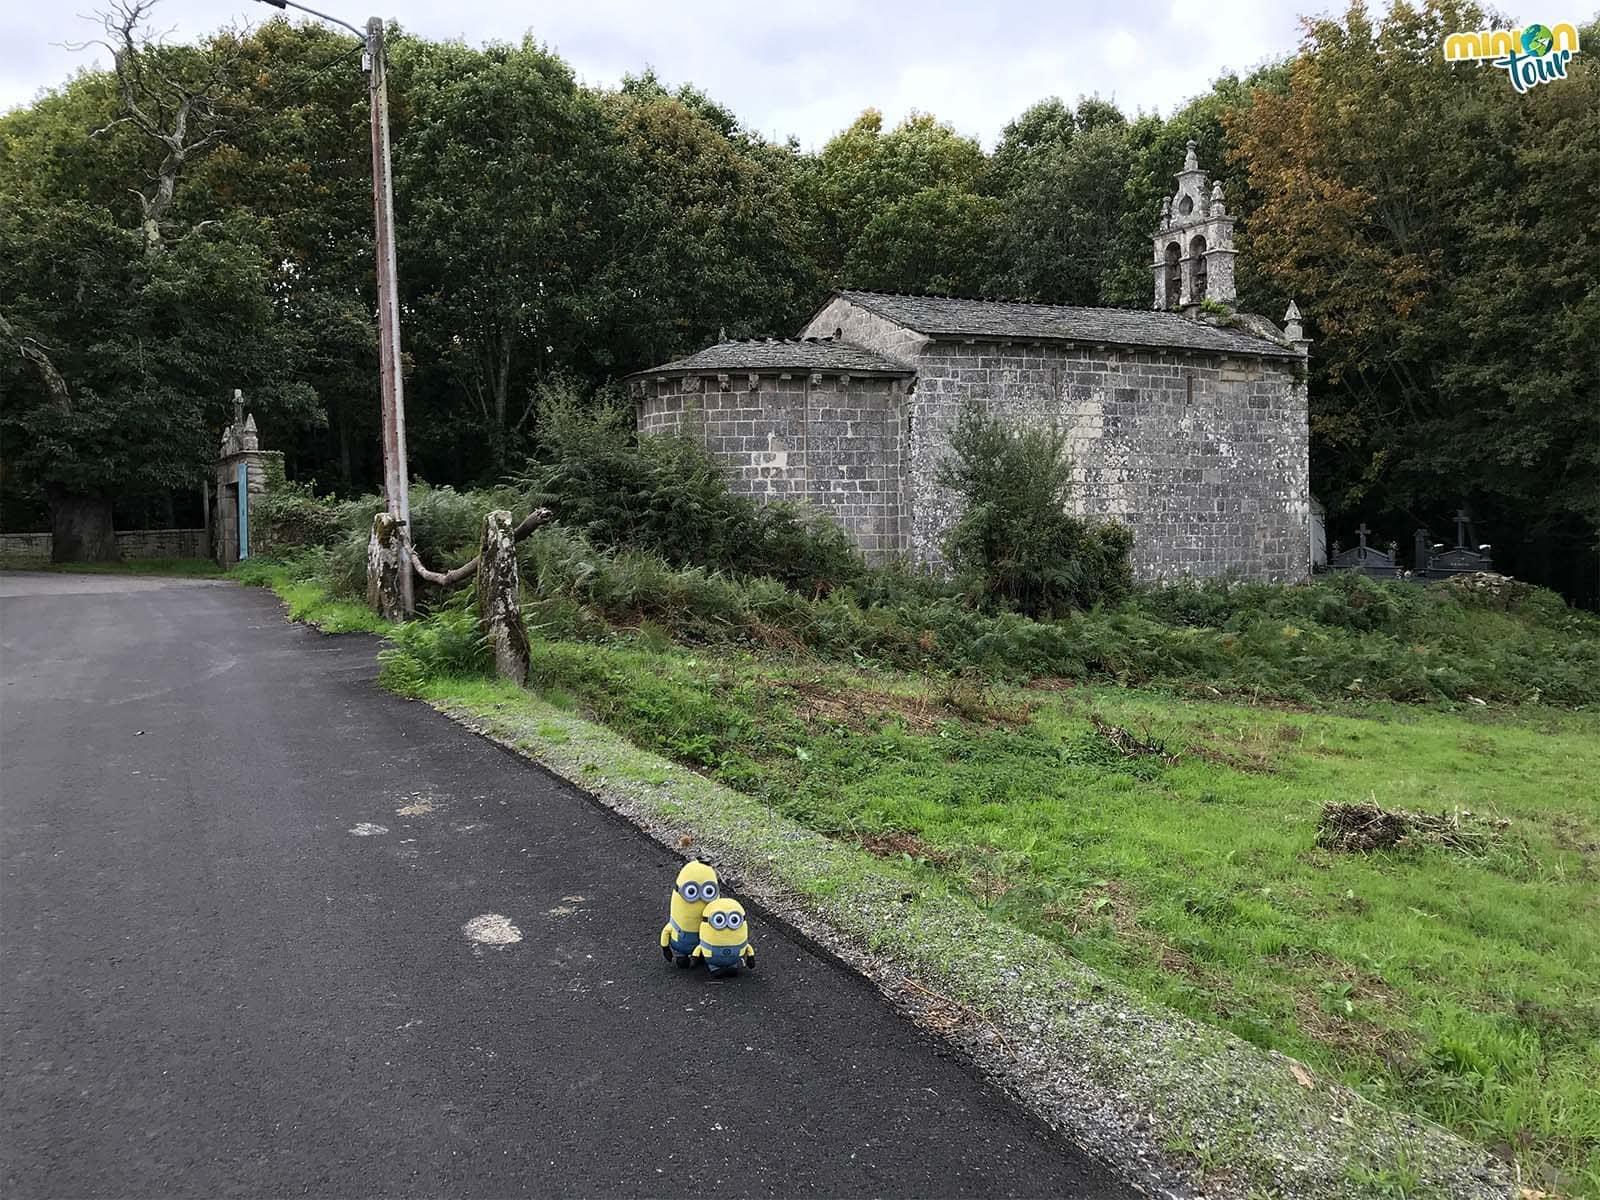 Nos hemos encontrado una iglesia muy chula